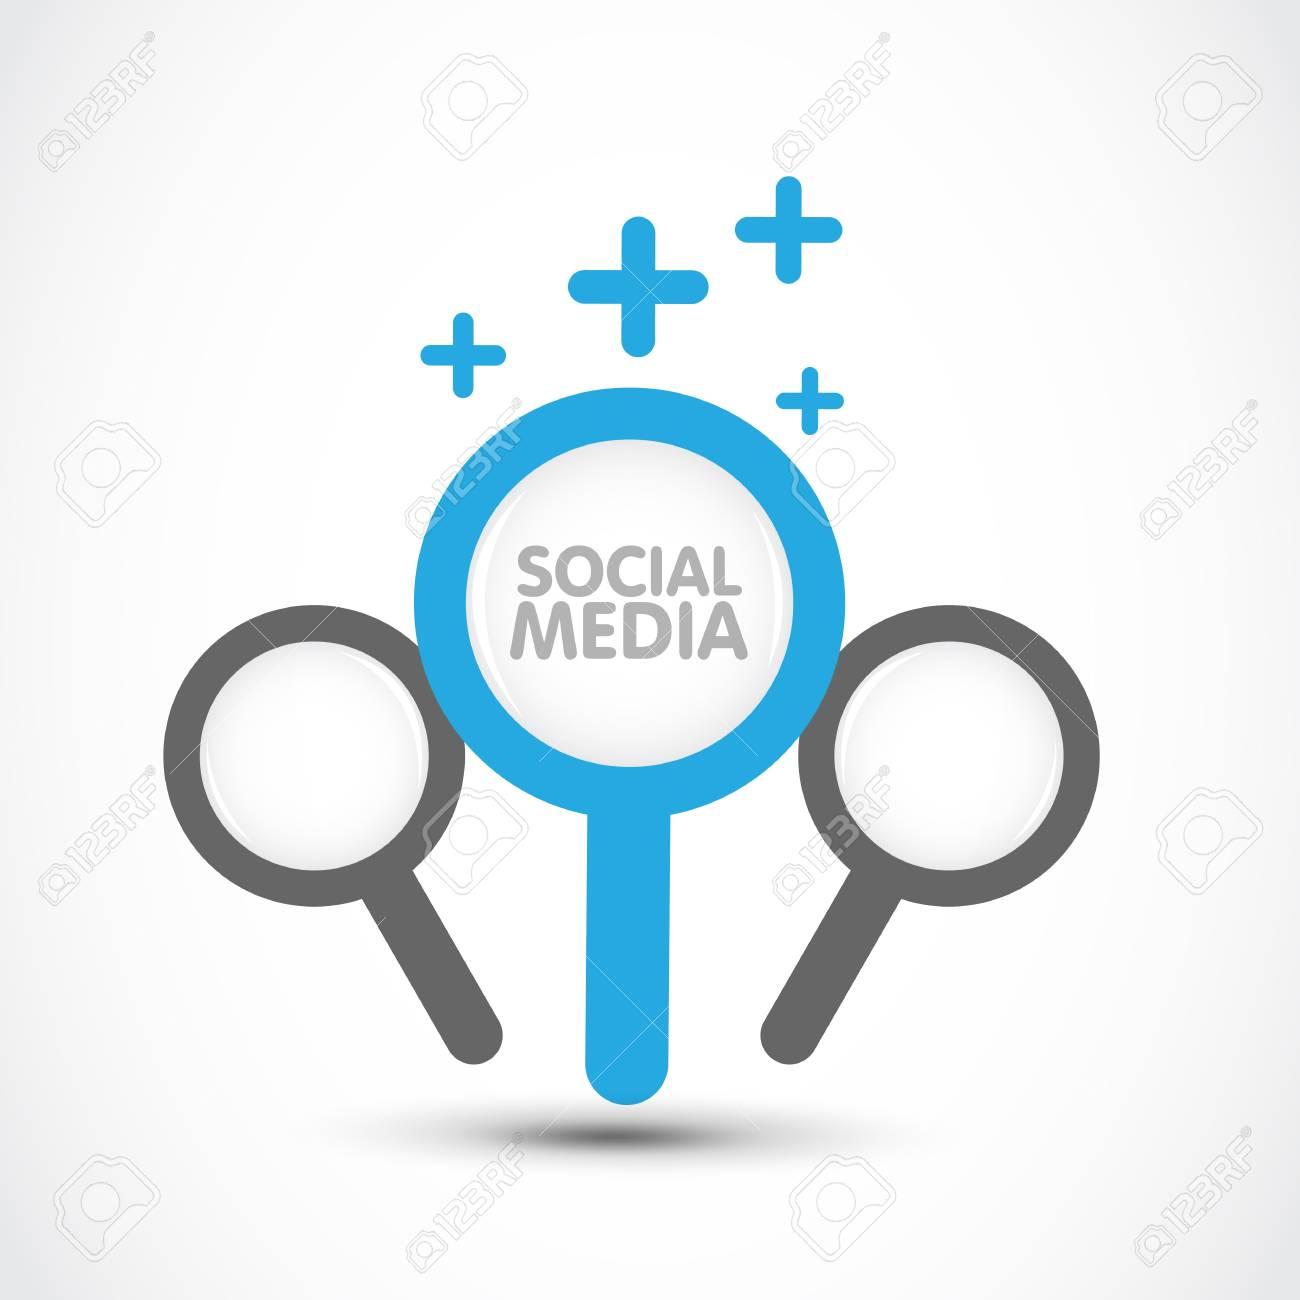 social media search concept